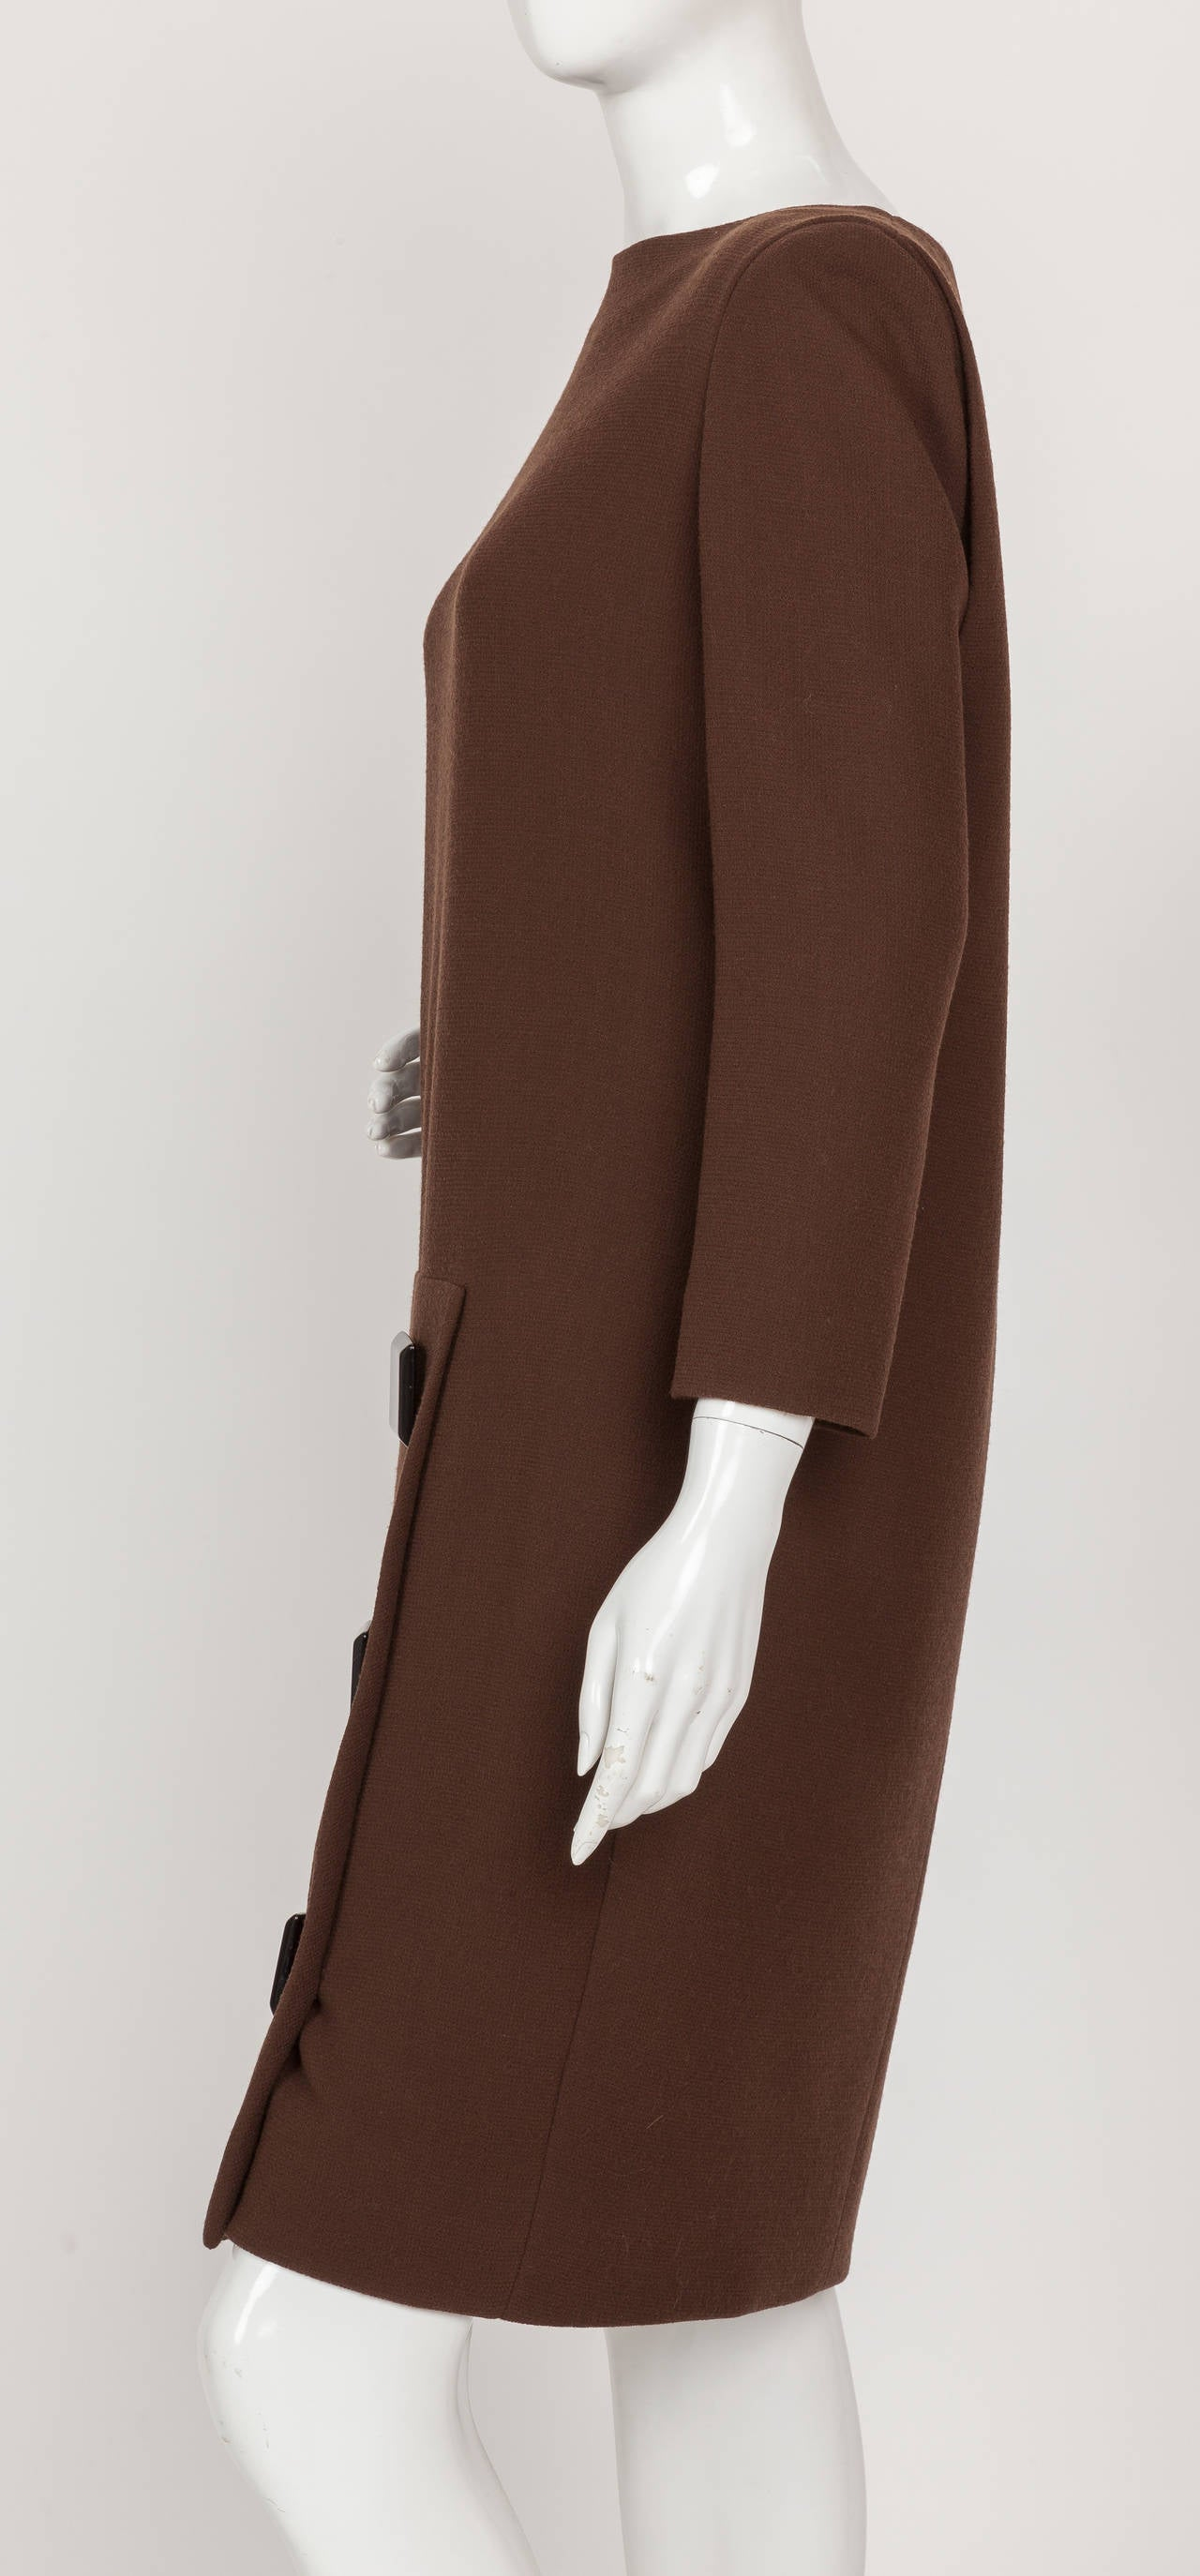 Women's Avant Garde Pierre Cardin Haute Couture Asymmetric Wool Cocktail Dress ca. 1992 For Sale